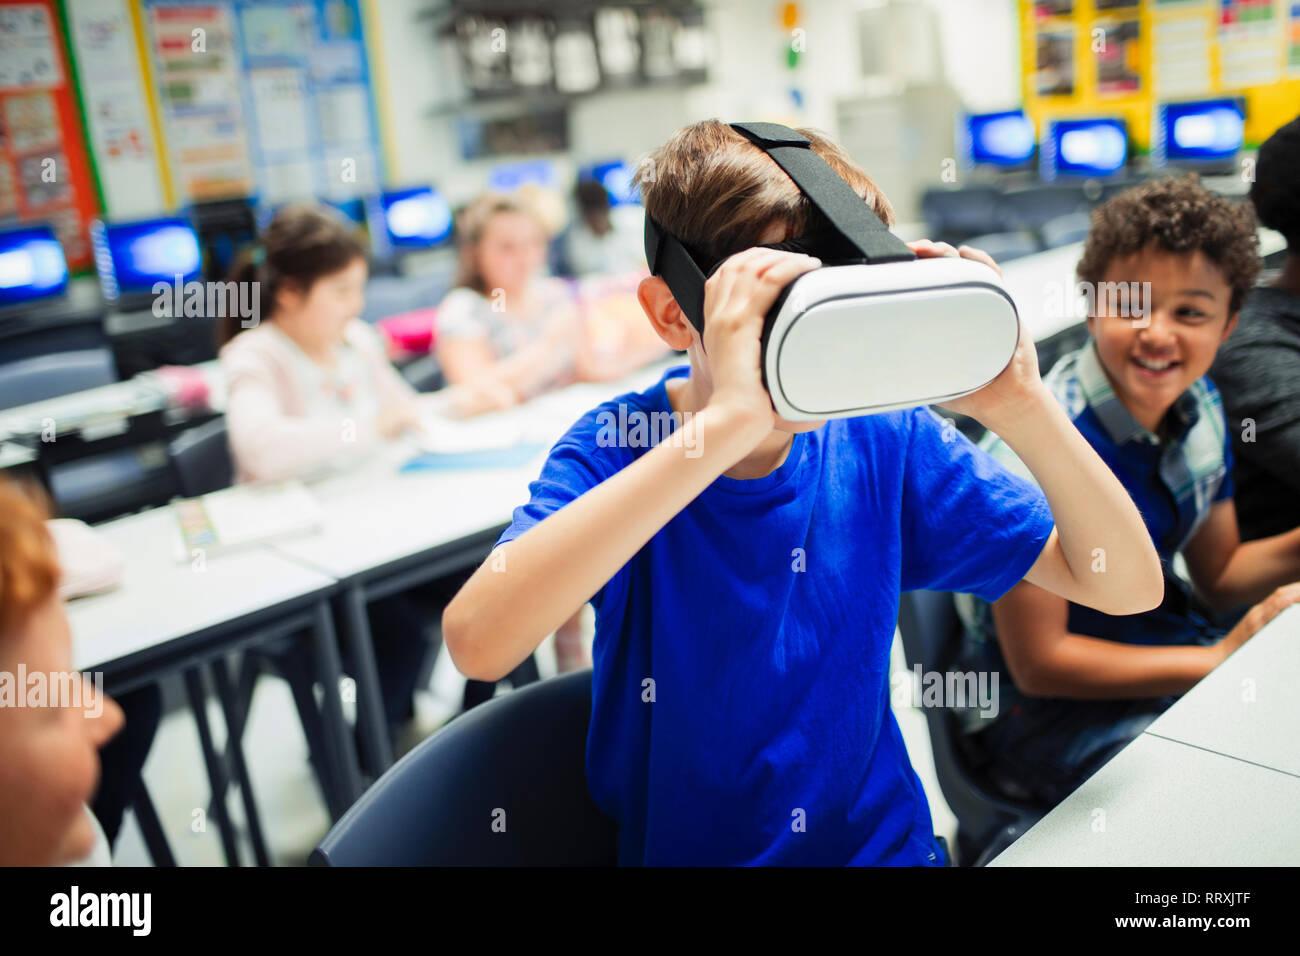 Junior high school boy student using virtual reality simulator glasses in classroom Stock Photo